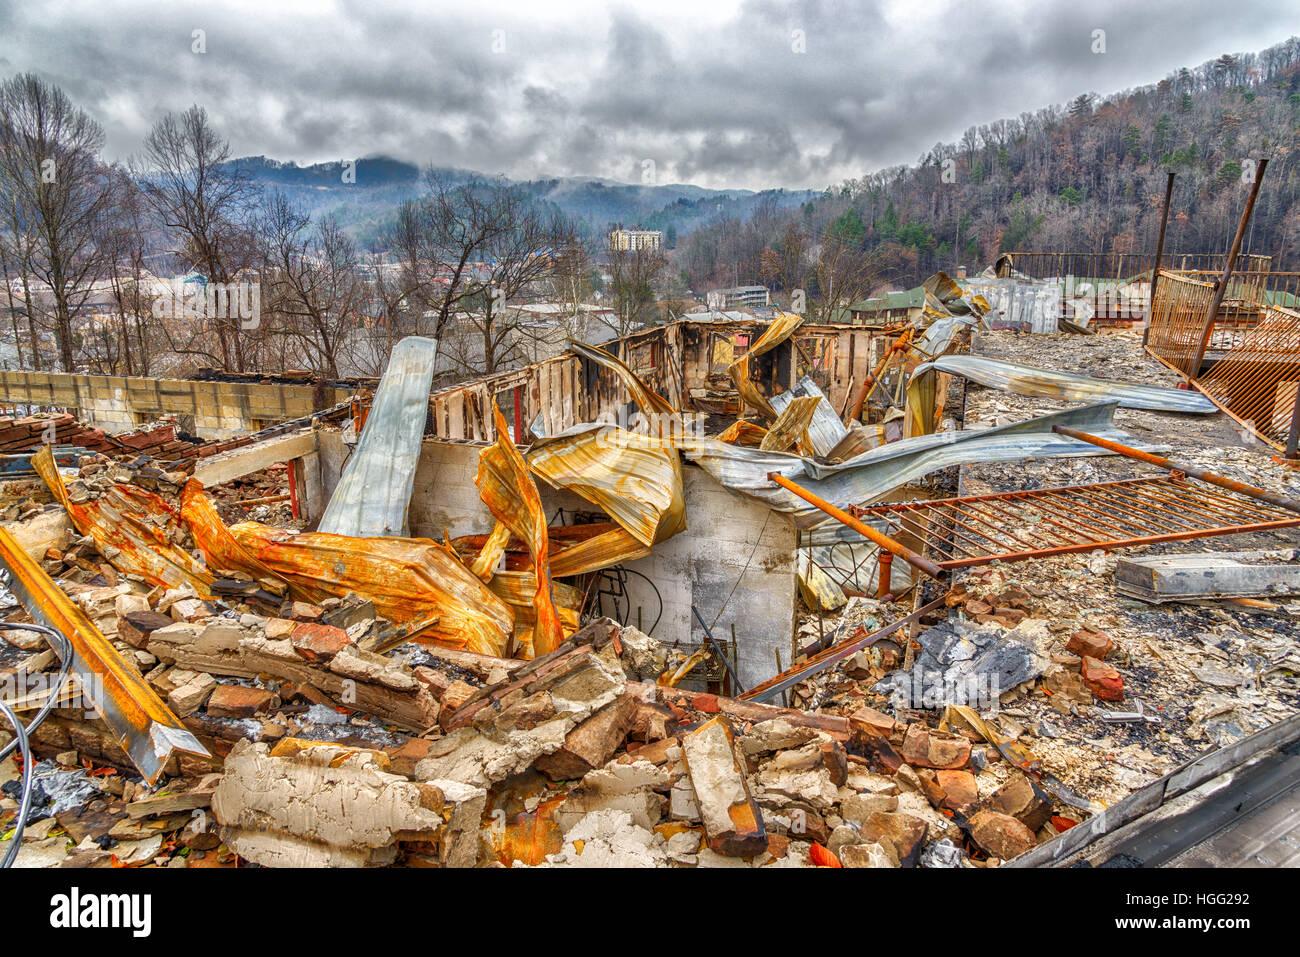 GATLINBURG, TN/USA - December 14, 2016: A motel complex lies in ruins after a major forest fire roared through Gatlinburg - Stock Image